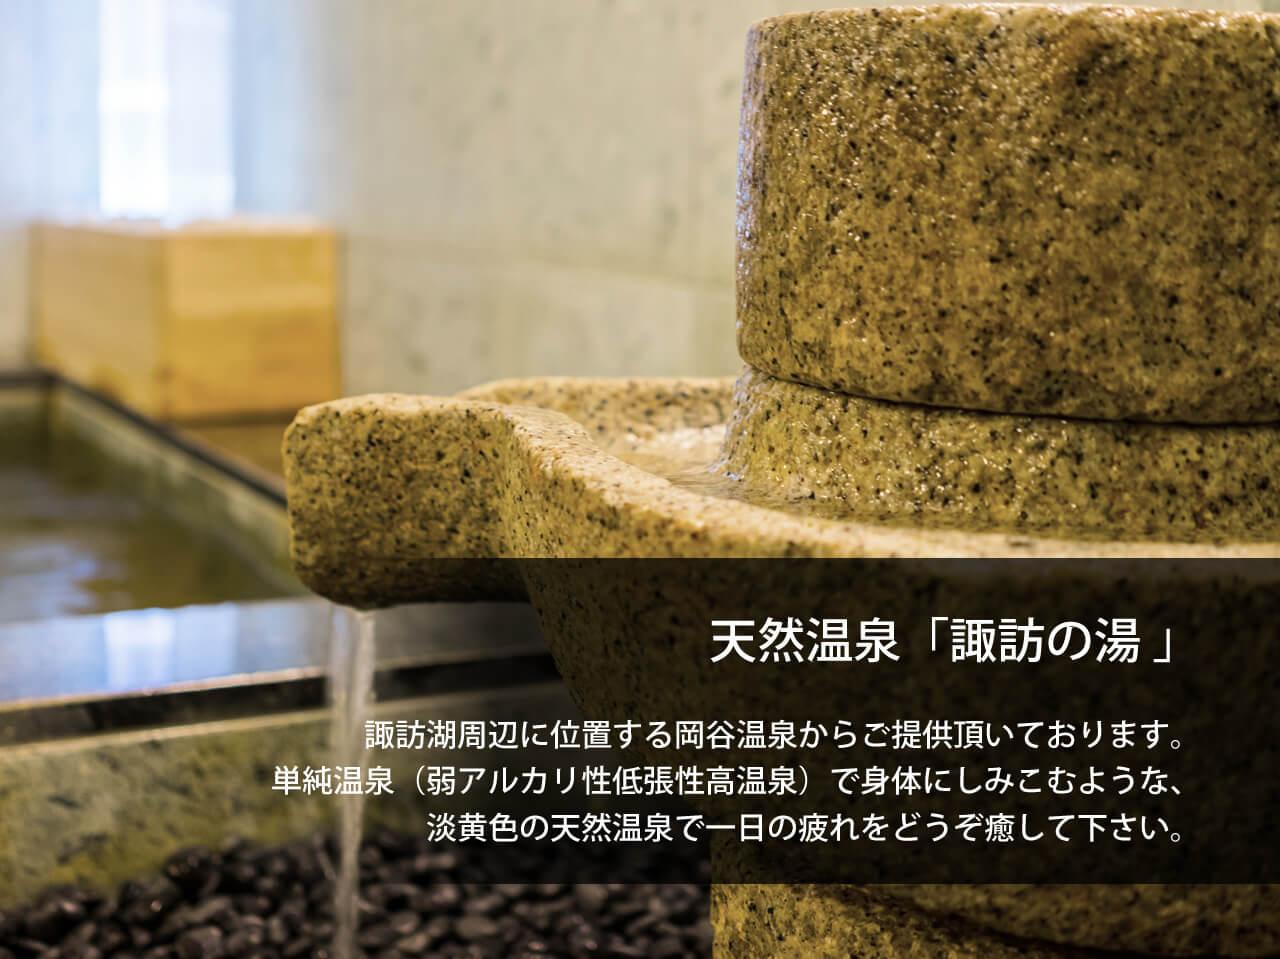 Super Hotel Matsumoto Natural Hot Springs